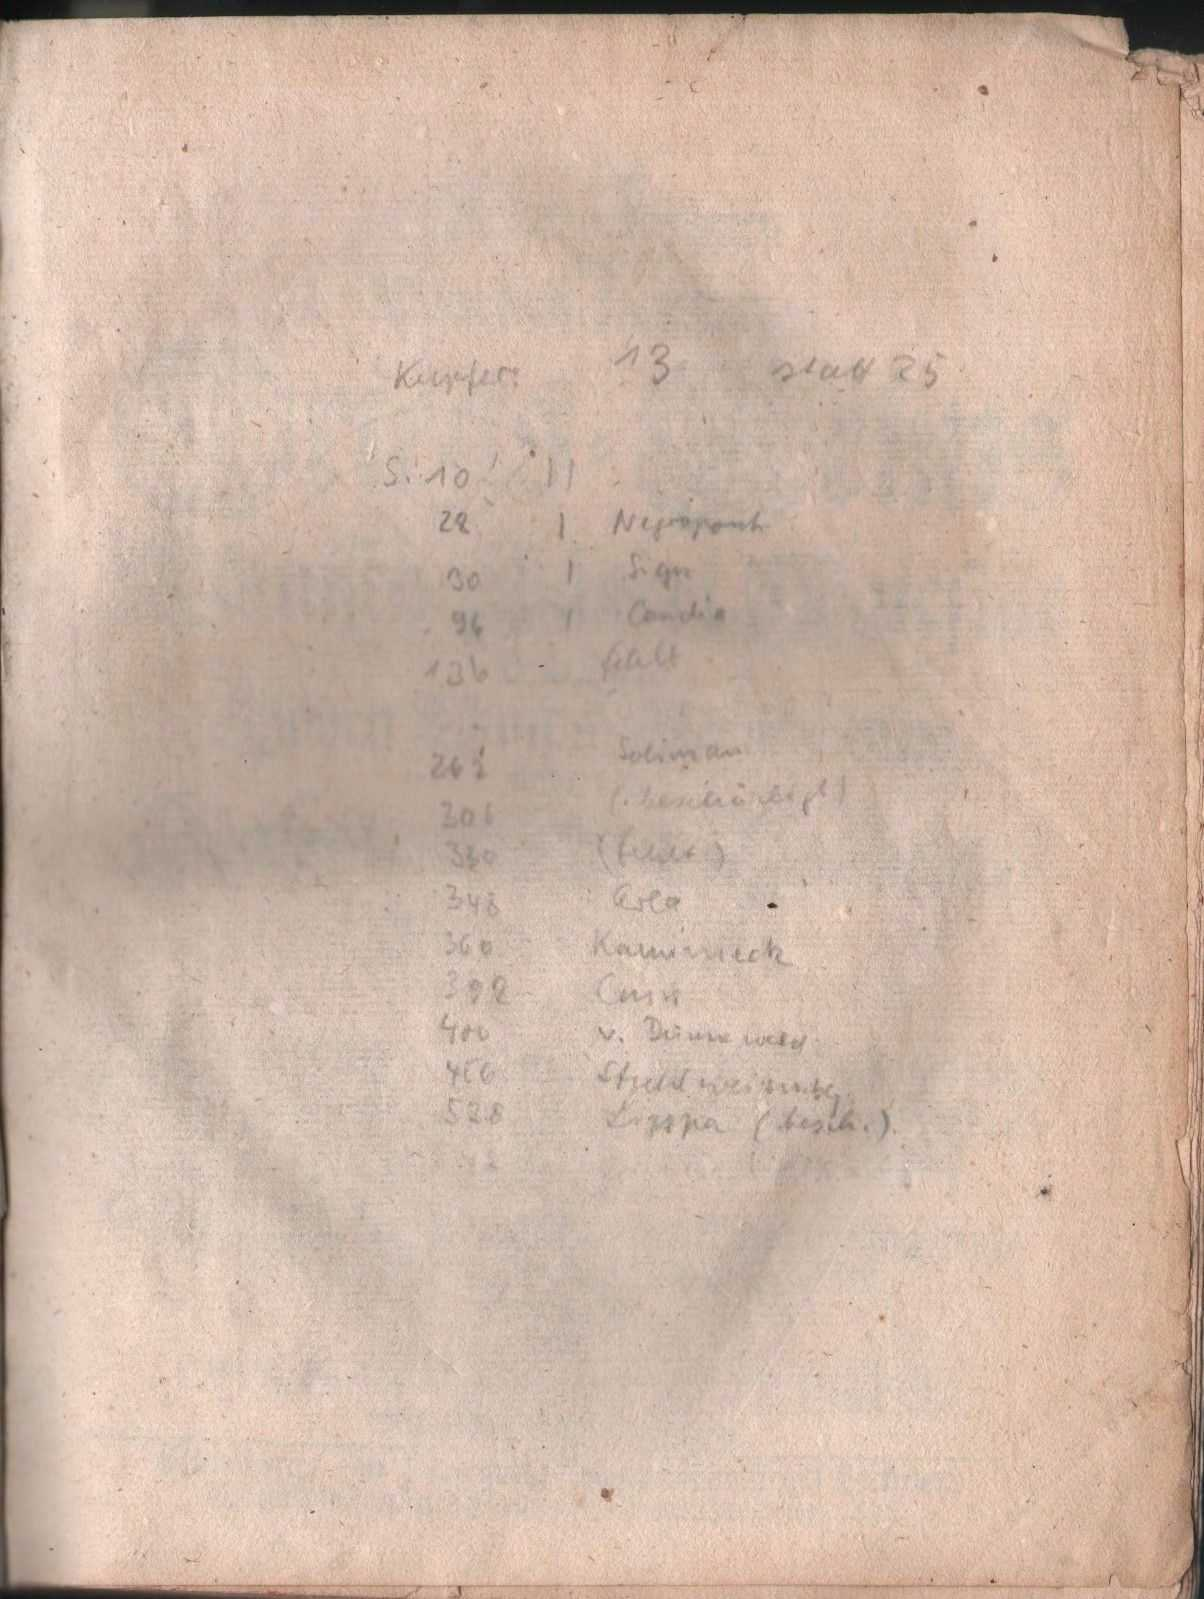 1688-Boethius-TRIUMPH-LEUCHTENDEN-KRIEGS-HELMS-Vol-3-History-Christian-Ottoman-401133054023-12